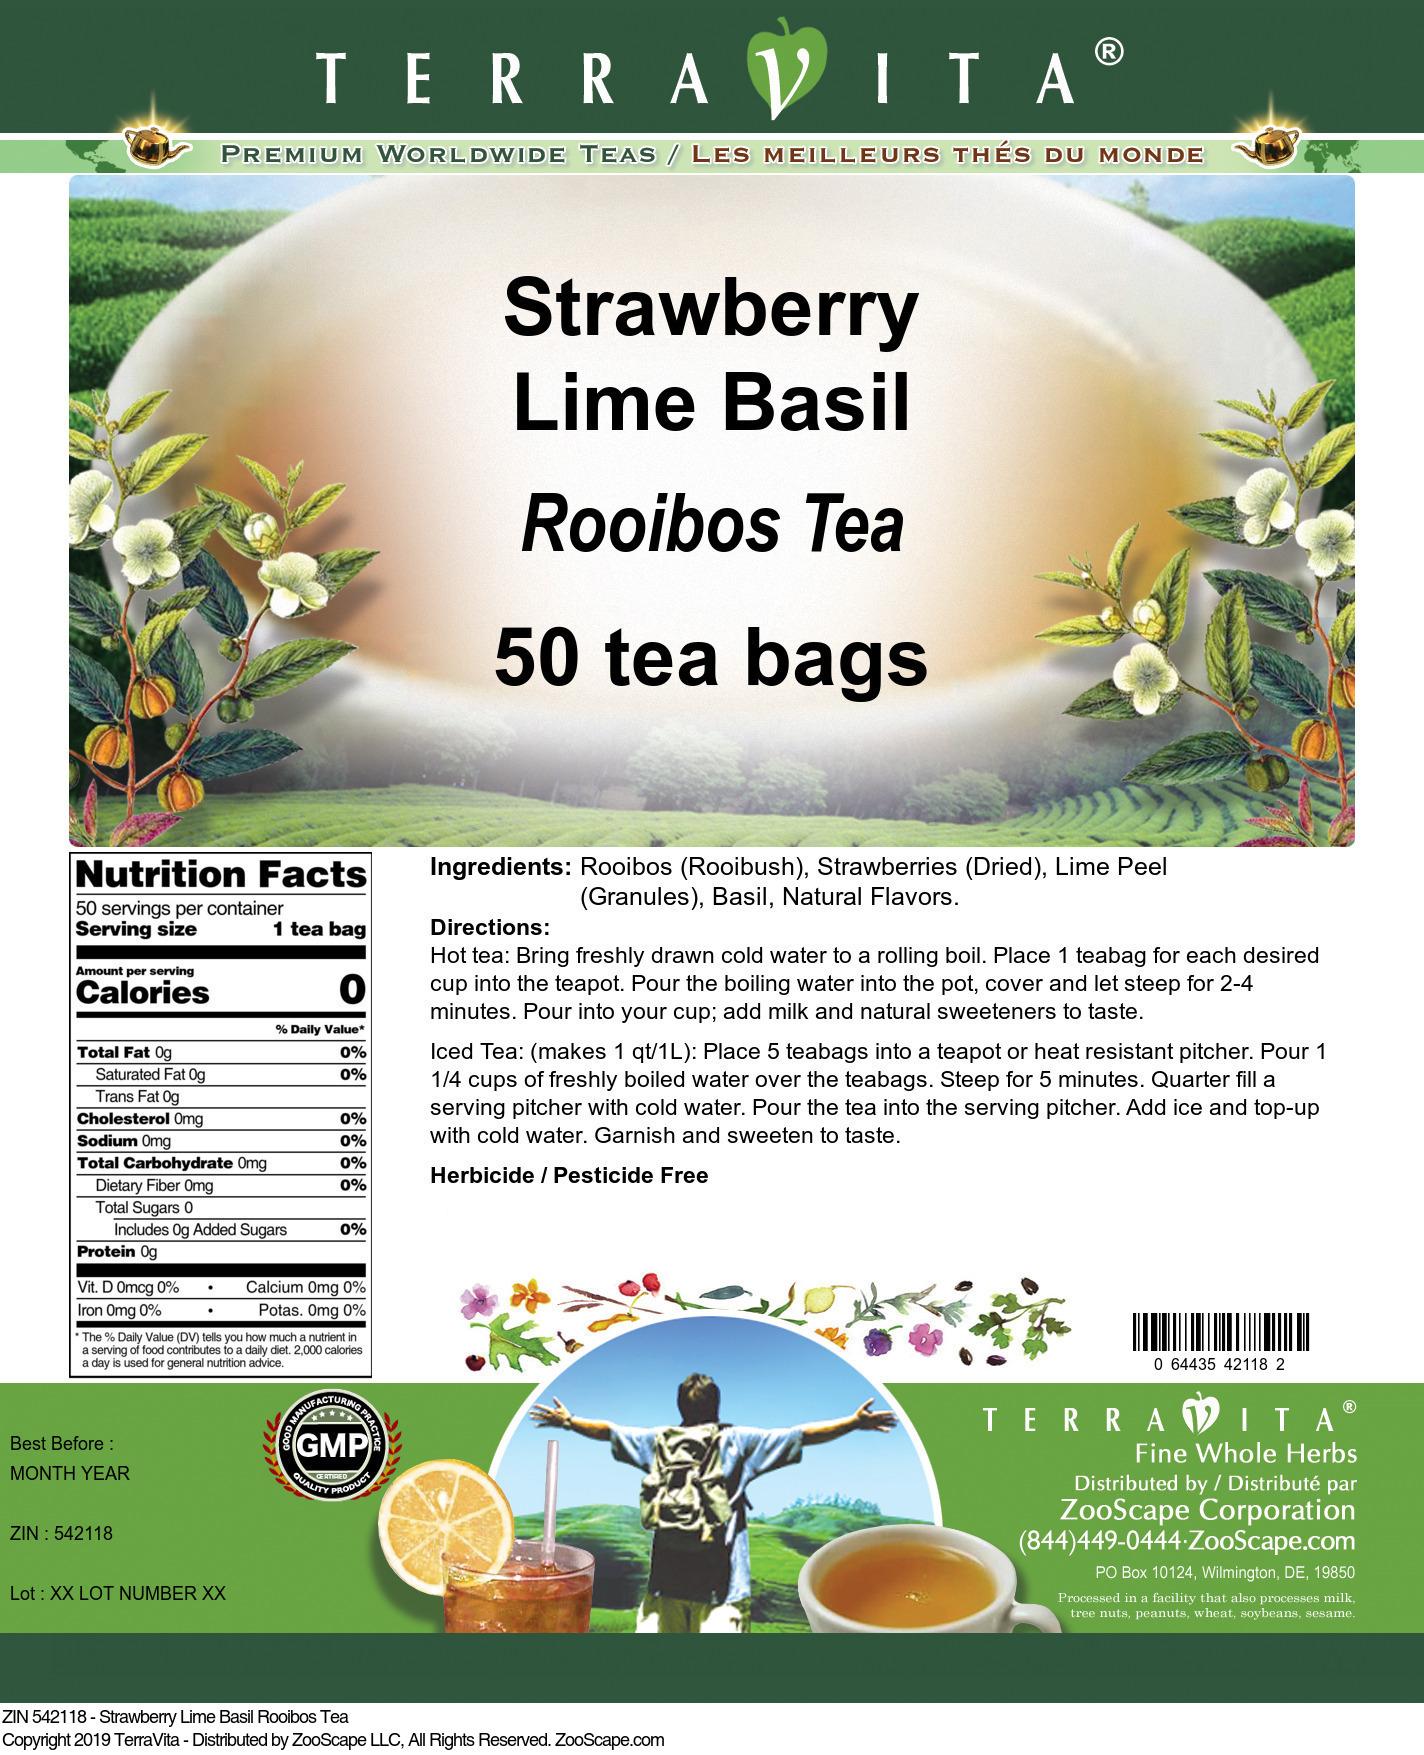 Strawberry Lime Basil Rooibos Tea